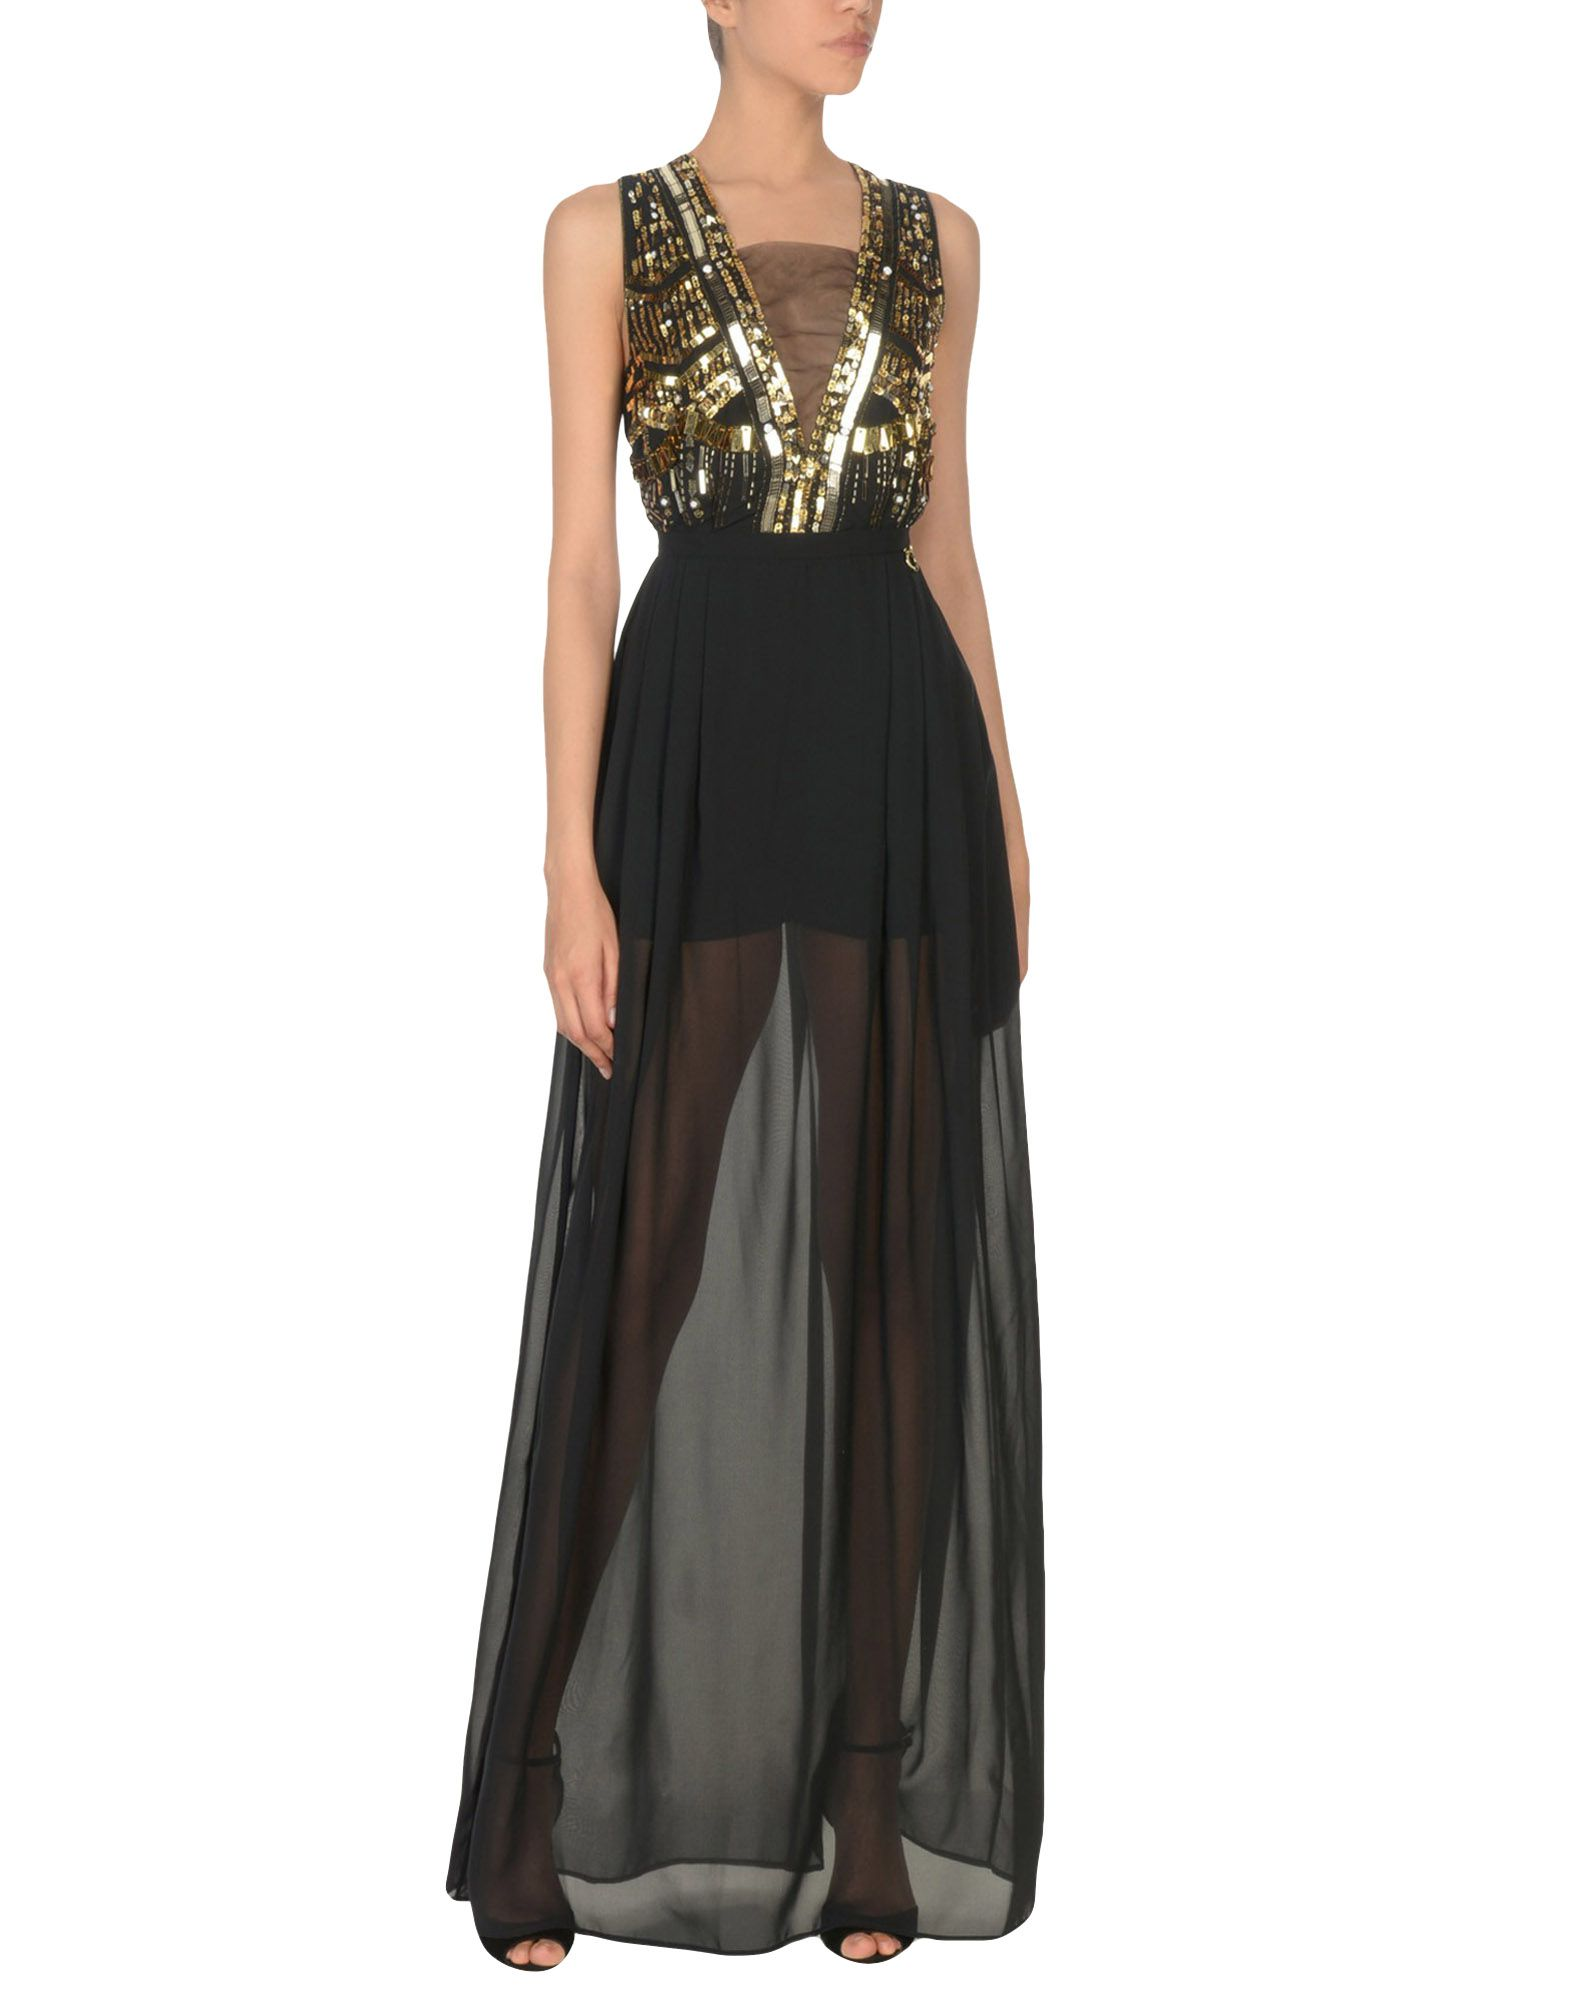 Vestito Lungo Mangano Donna - Acquista online su NLGYTmGz